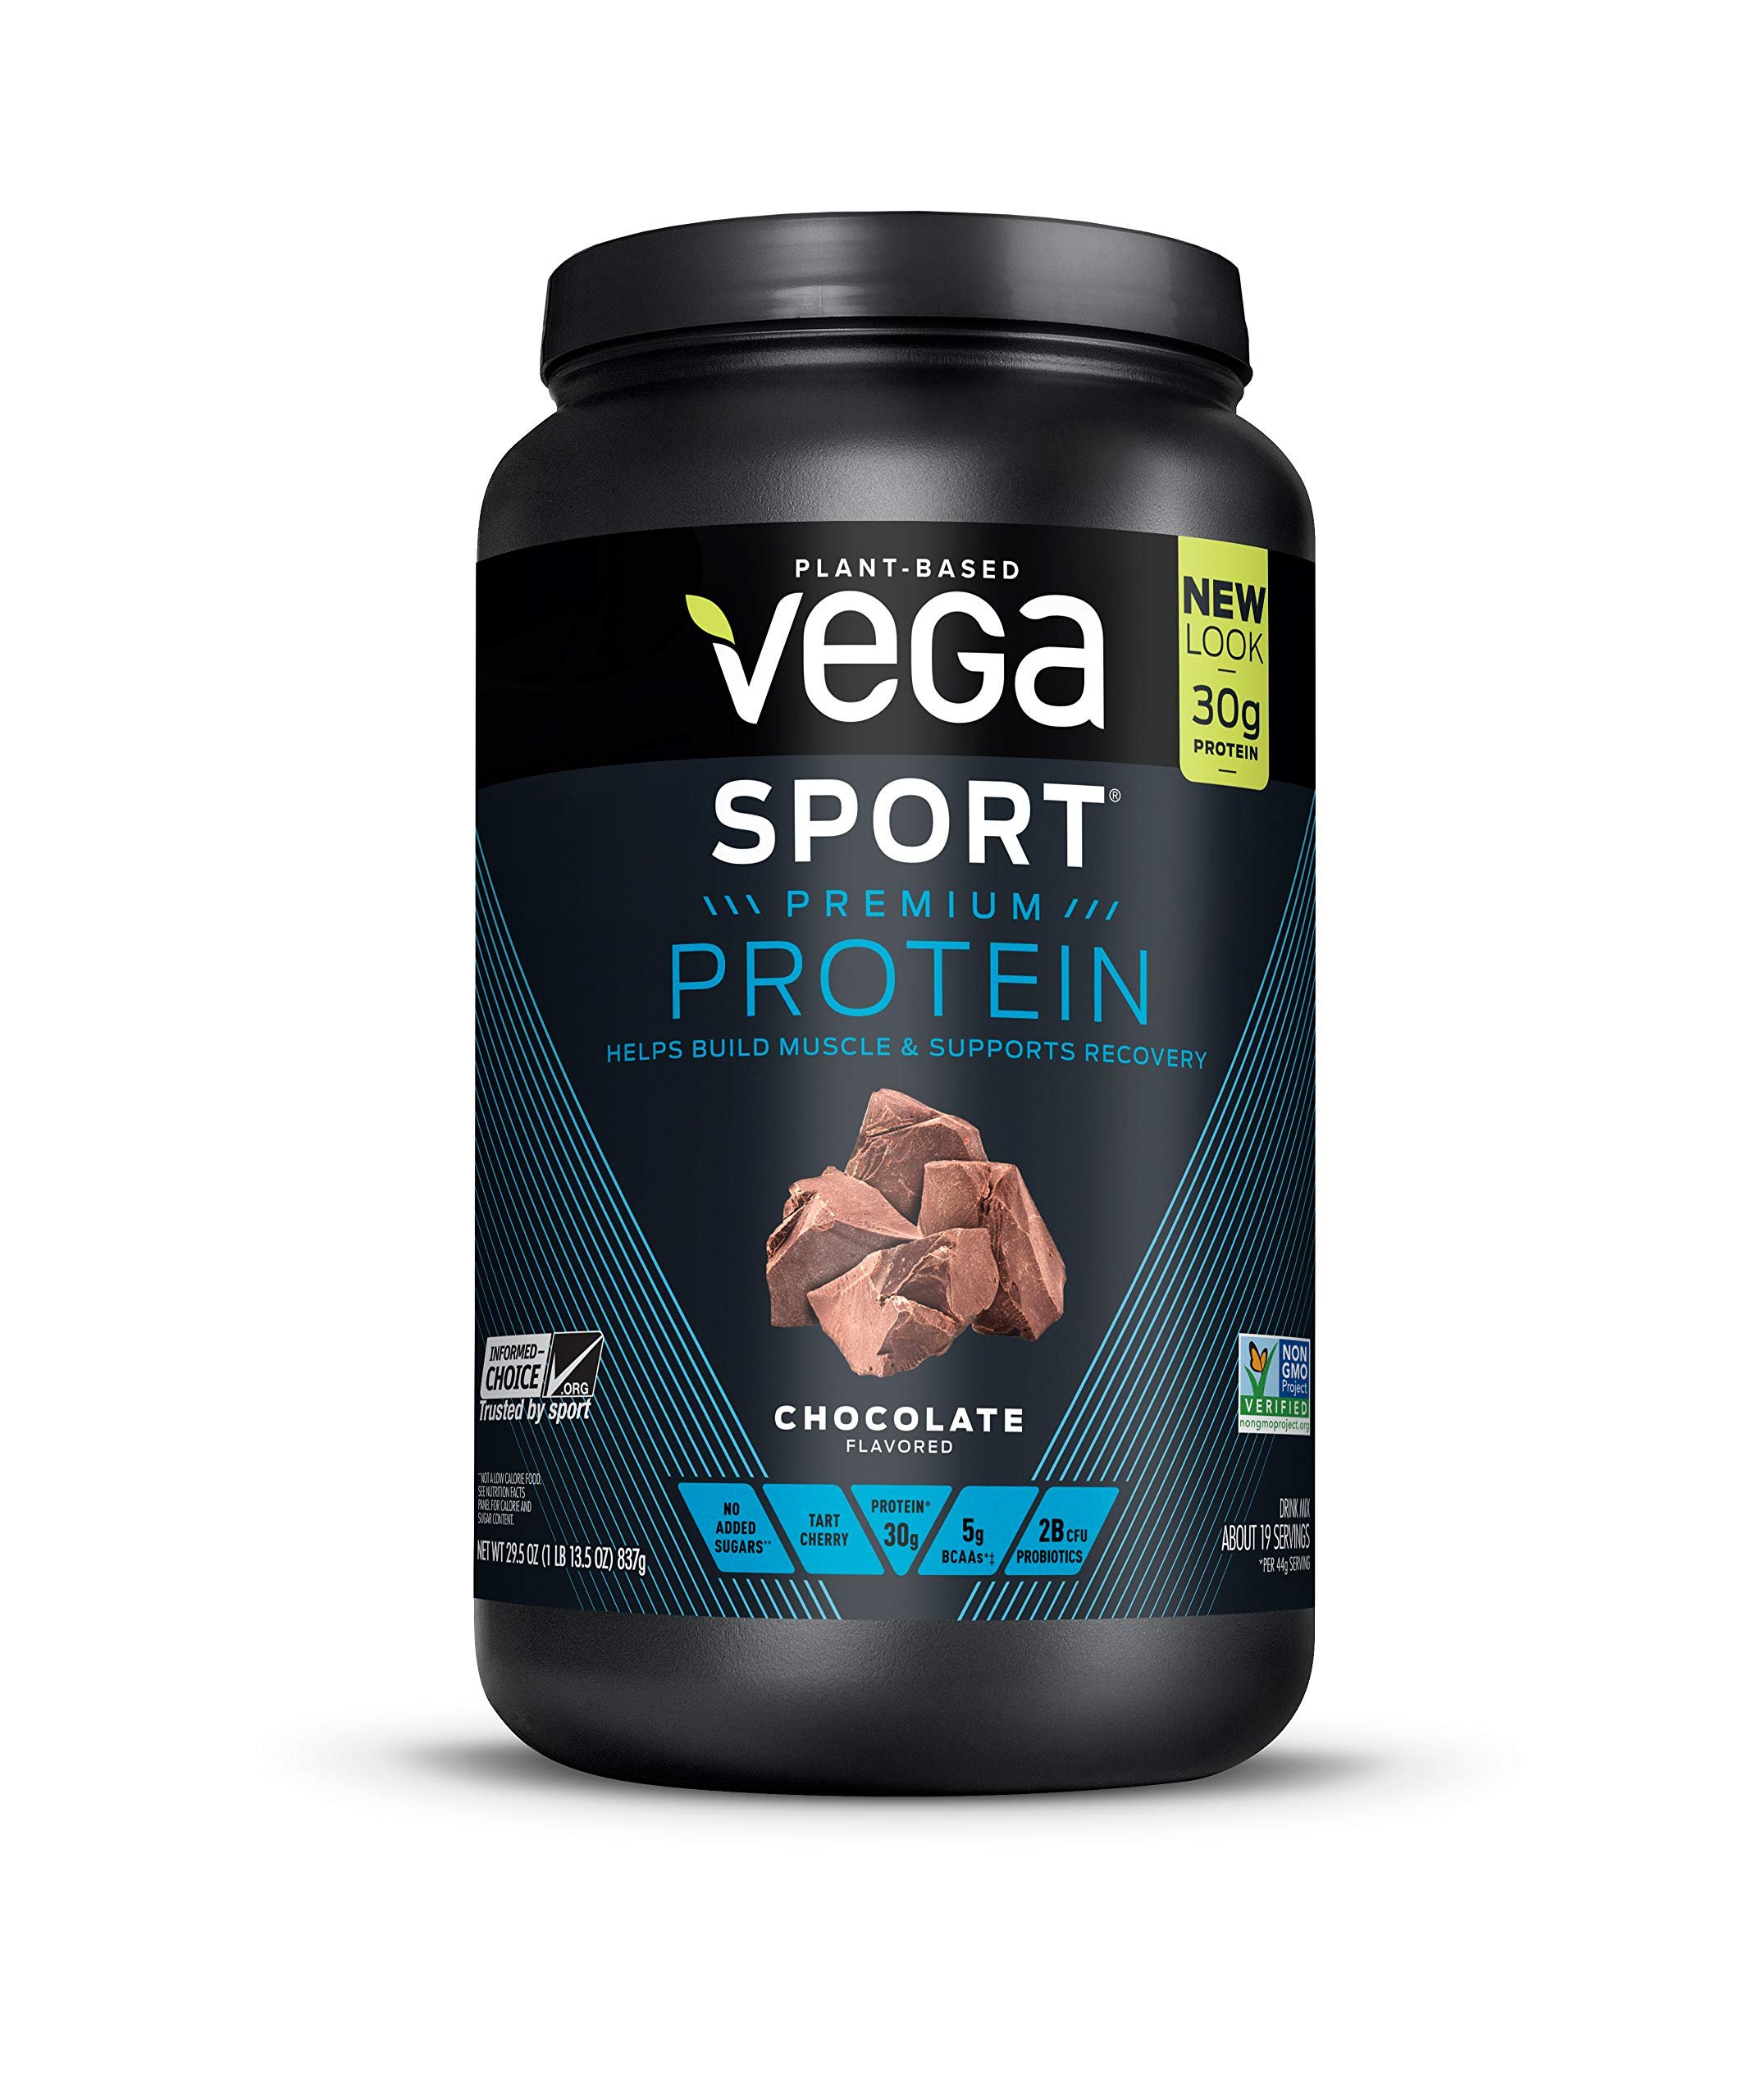 Vega Sport Protein Powder Chocolate(19 Servings, 29.5oz)  - Plant-Based Vegan Protein Powder, BCAAs, Amino Acid, tart cherry, Non Dairy, Keto-Friendly, Gluten Free,  Non GMO (Packaging May Vary)